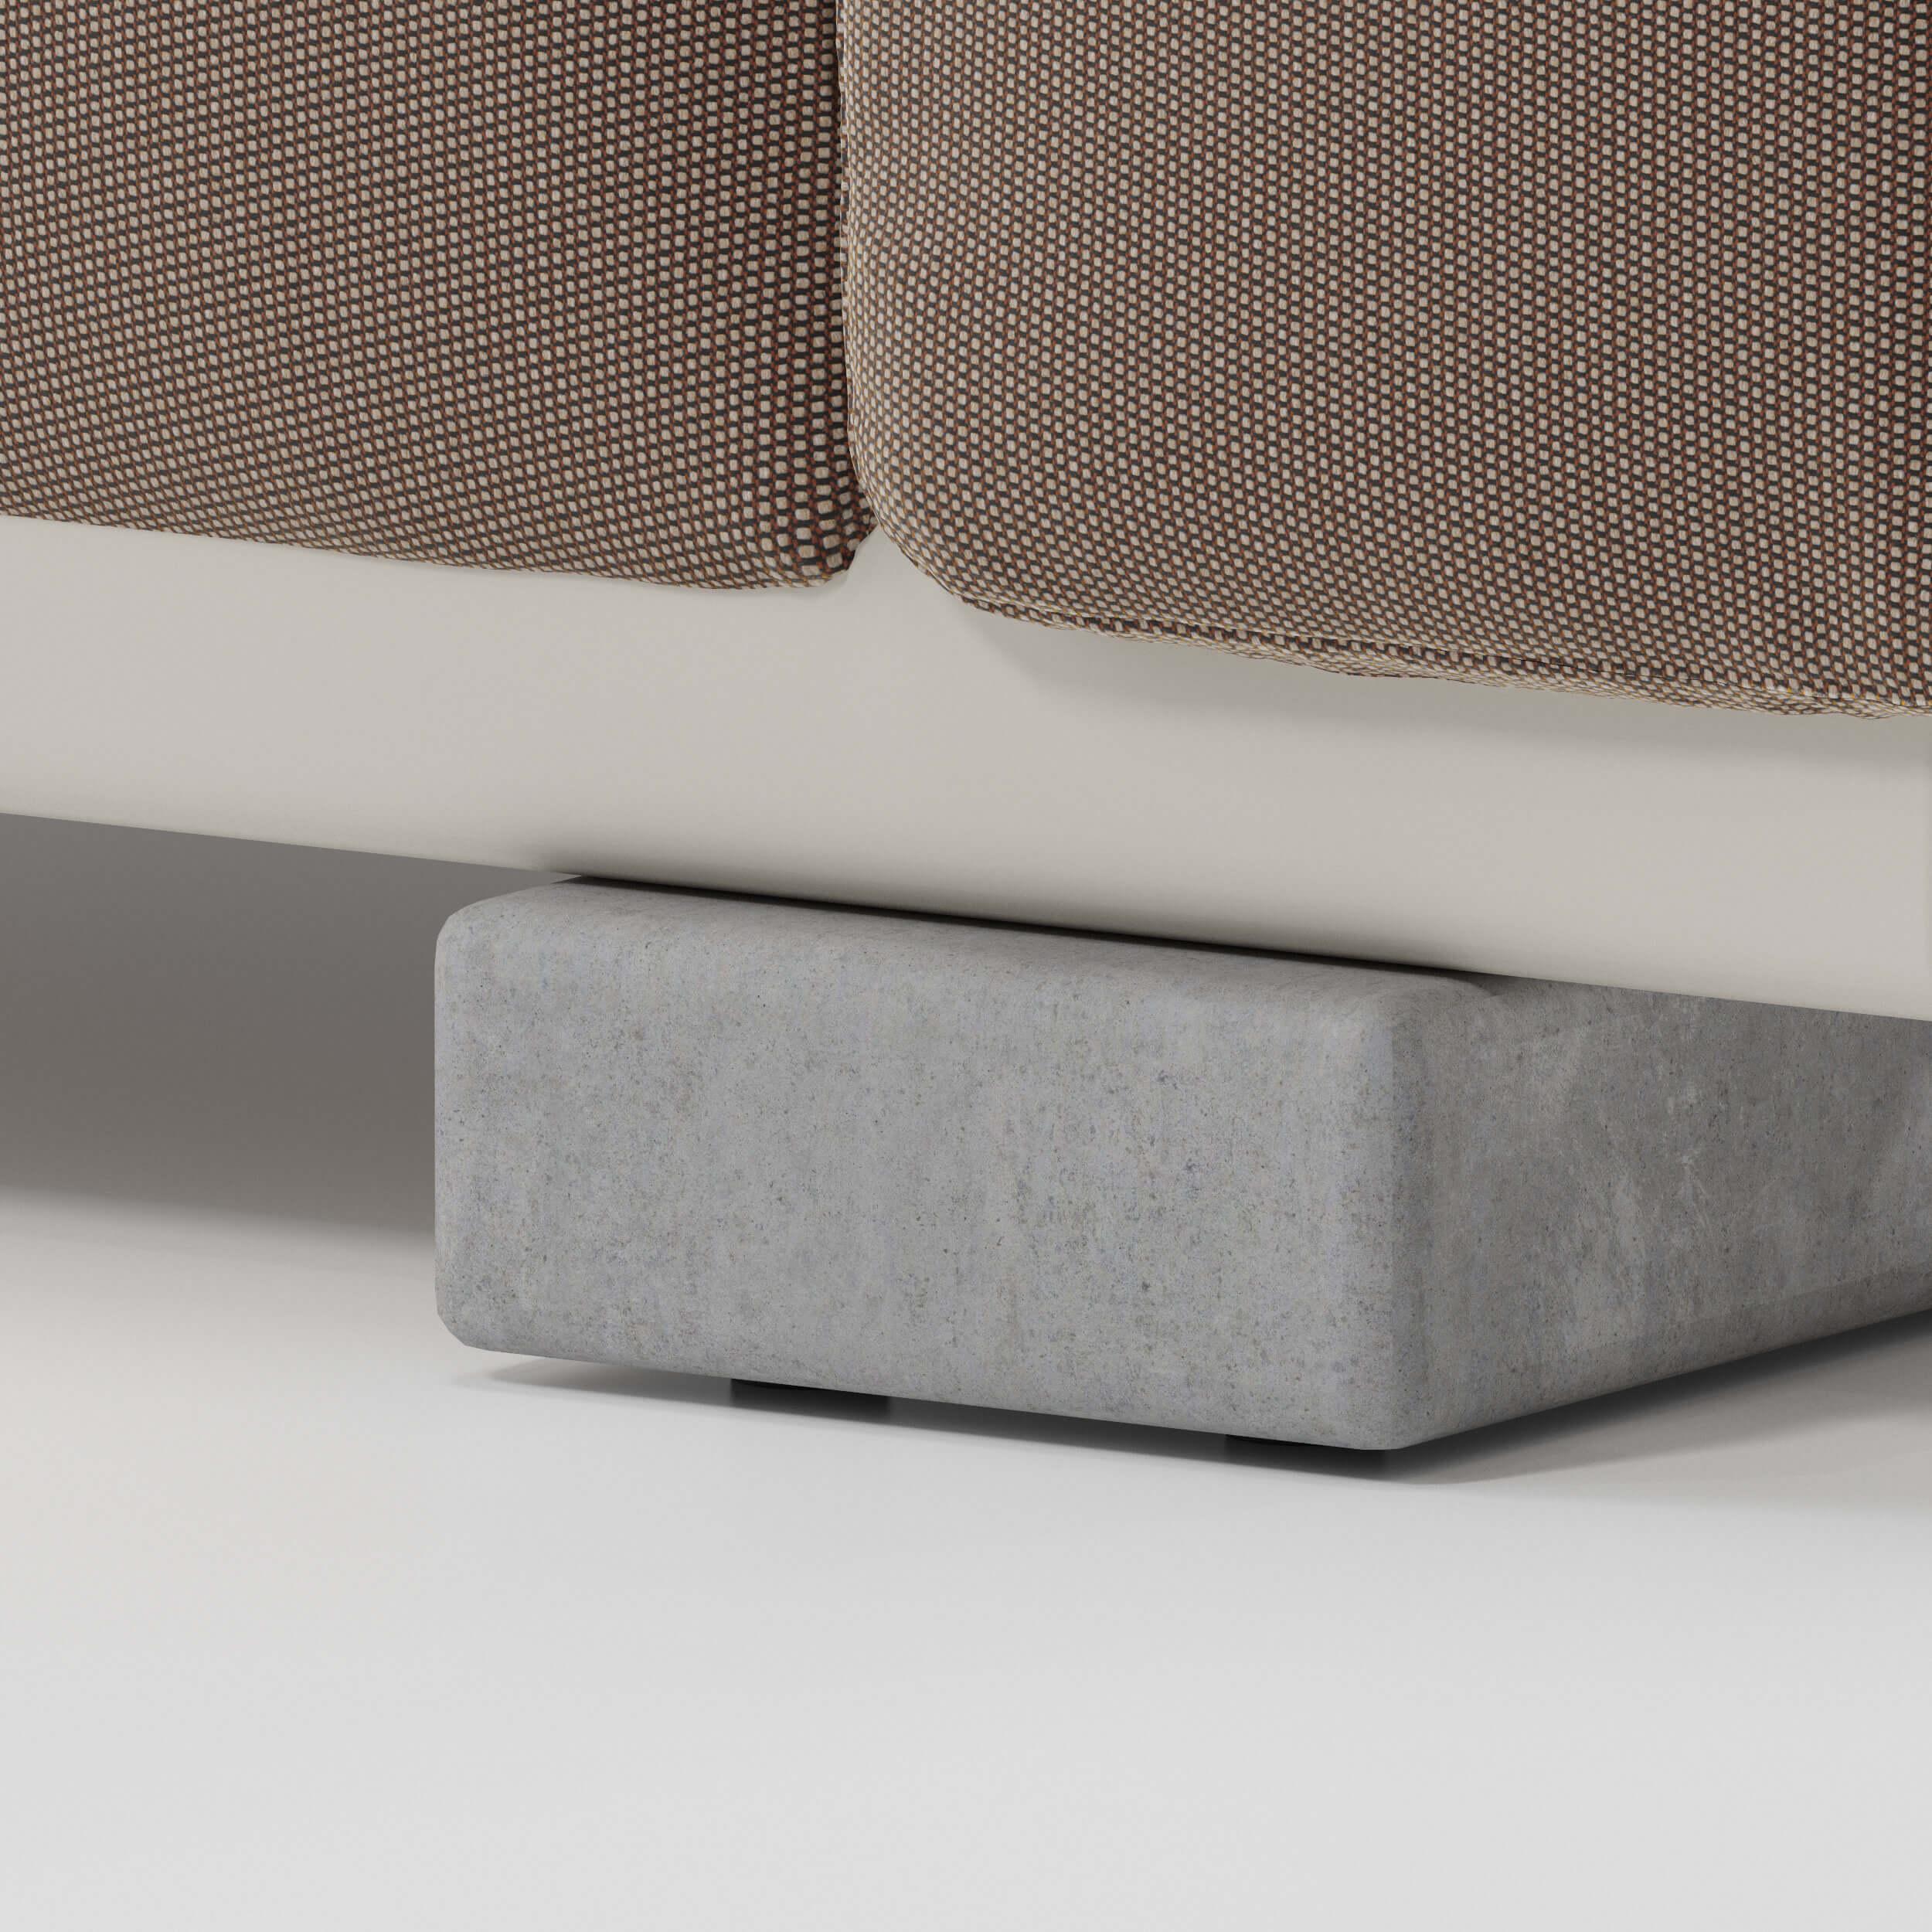 Concrete legs